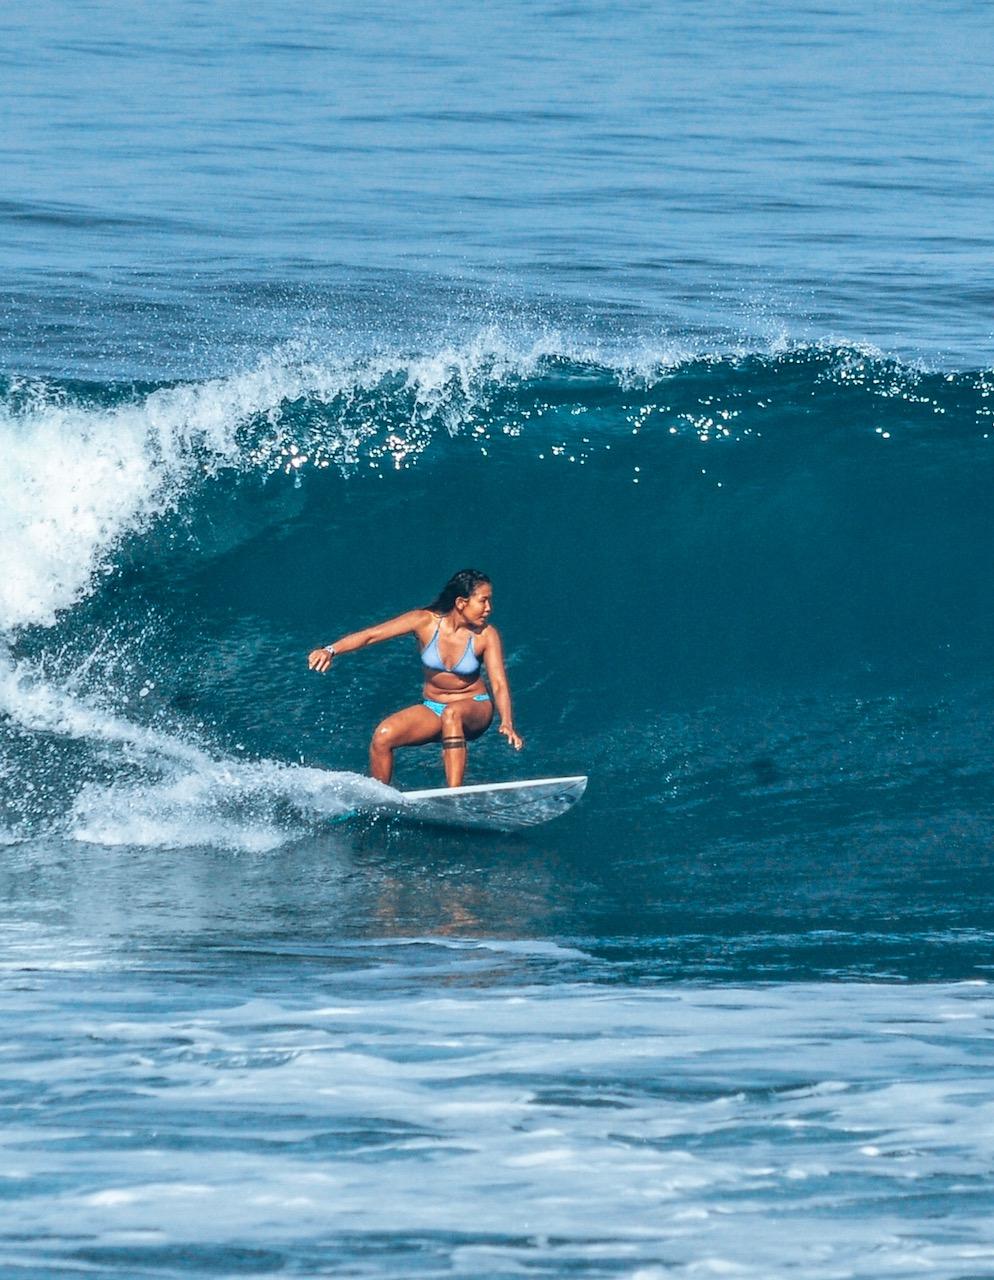 surfing_gita kaiser_cocoaloha